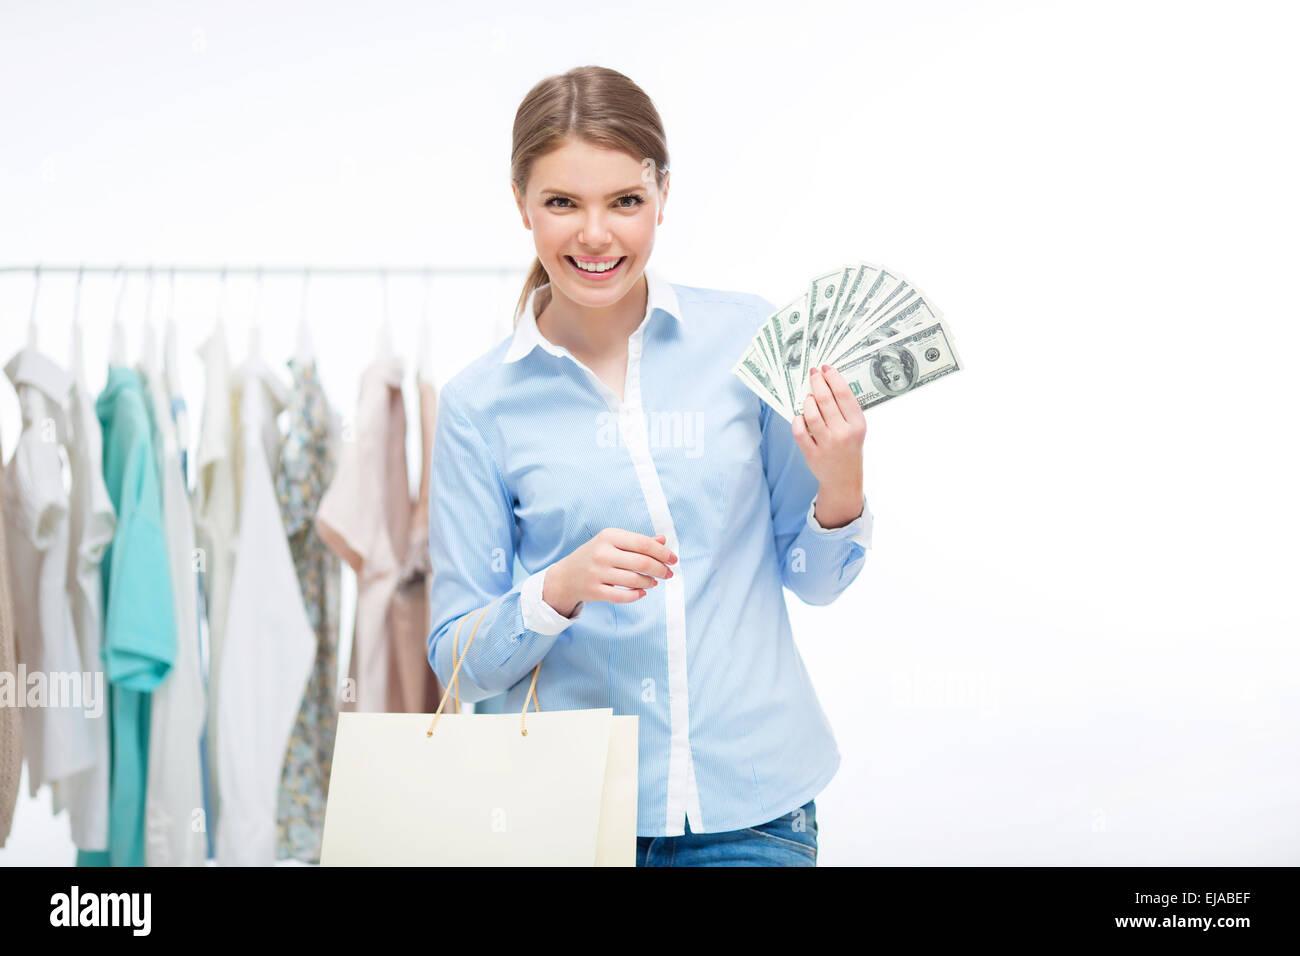 Spending money - Stock Image